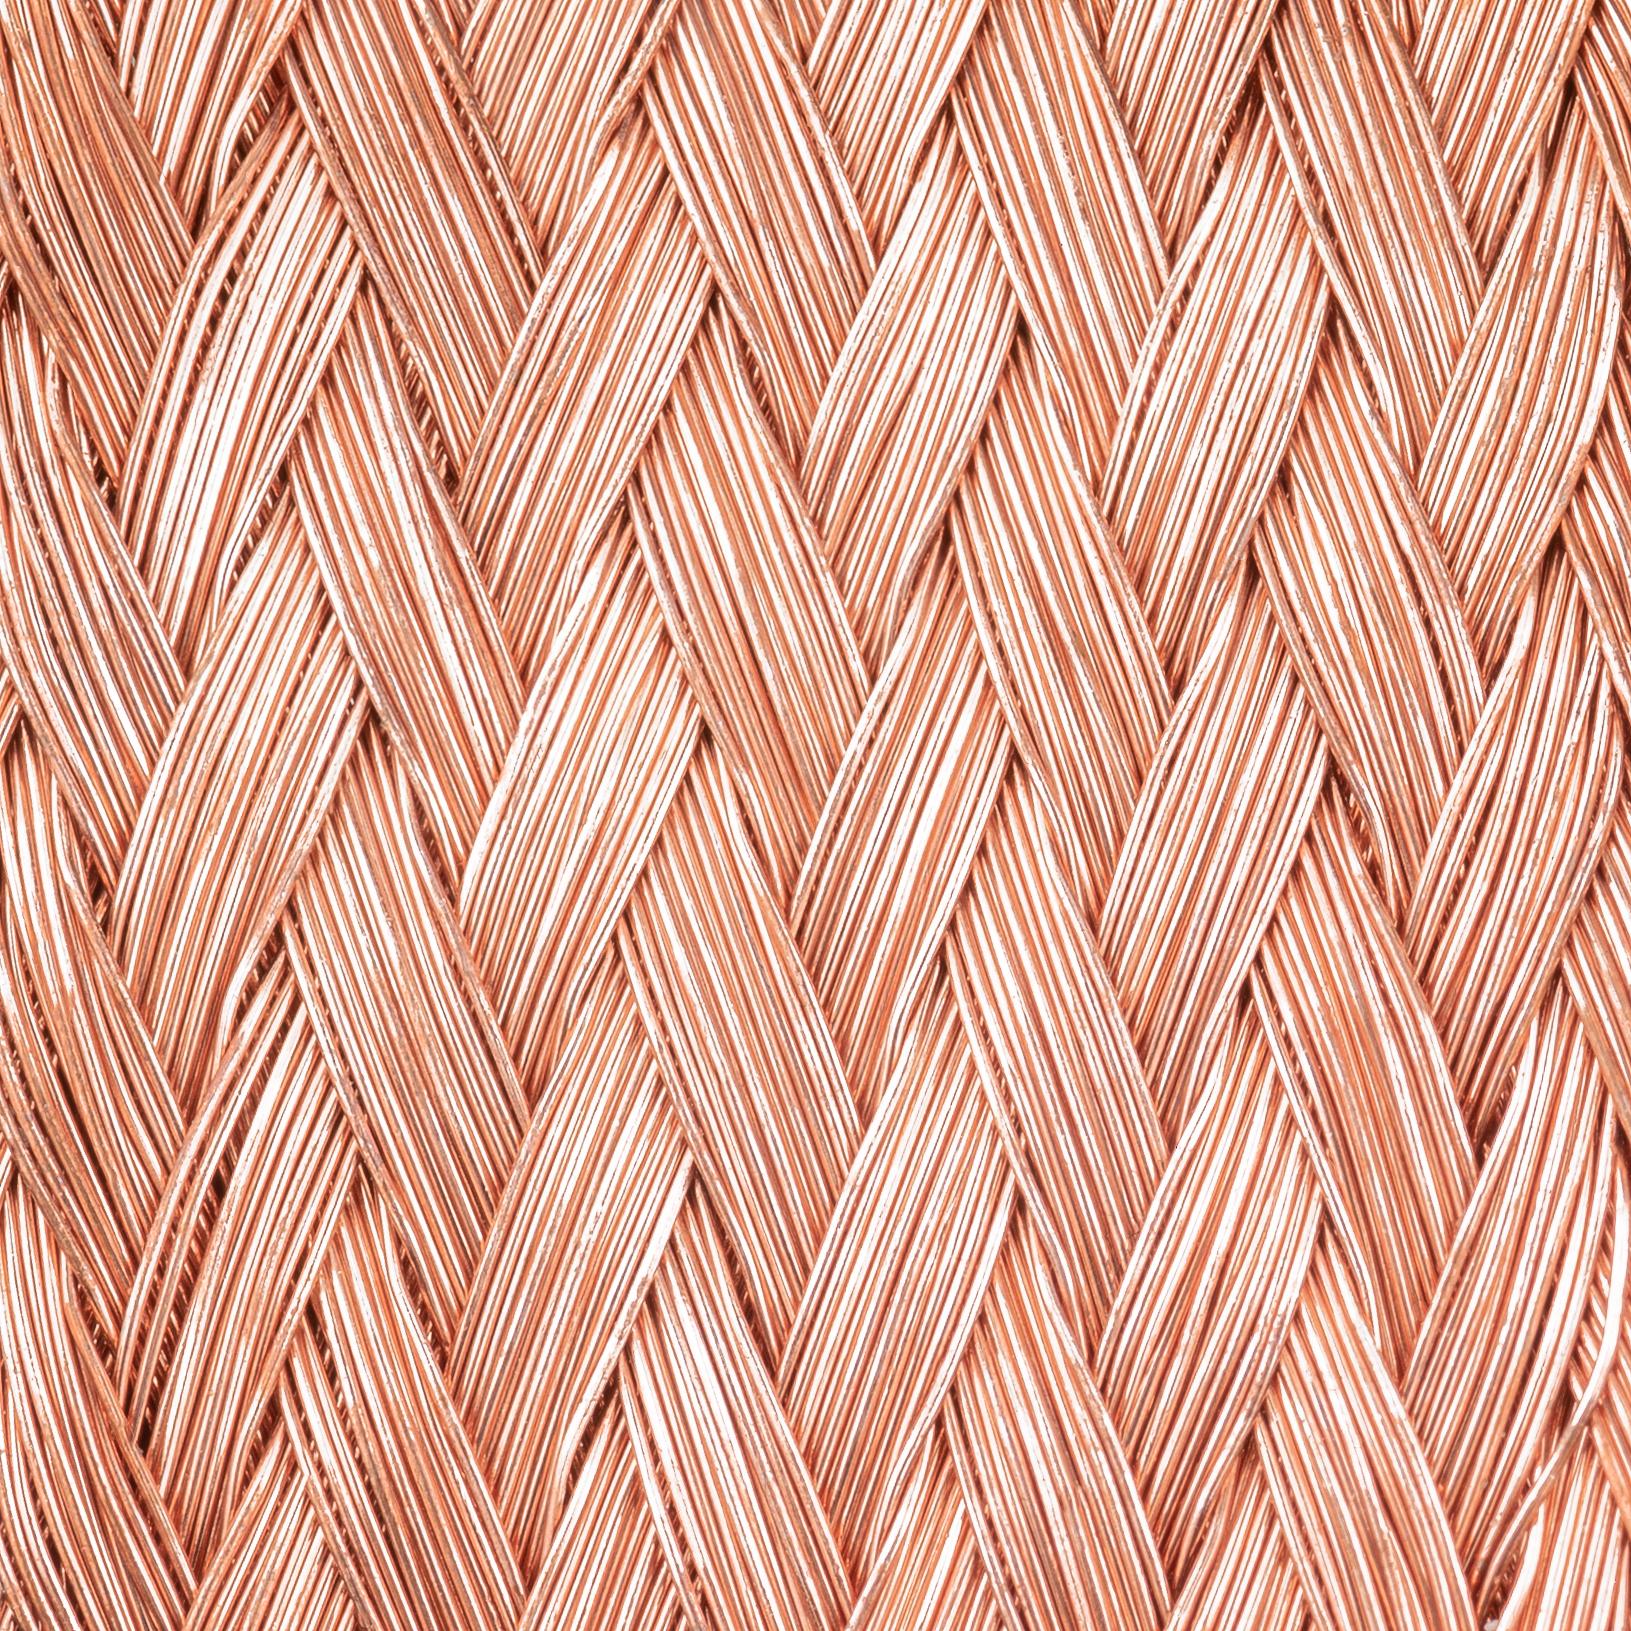 Copperbraid closeup